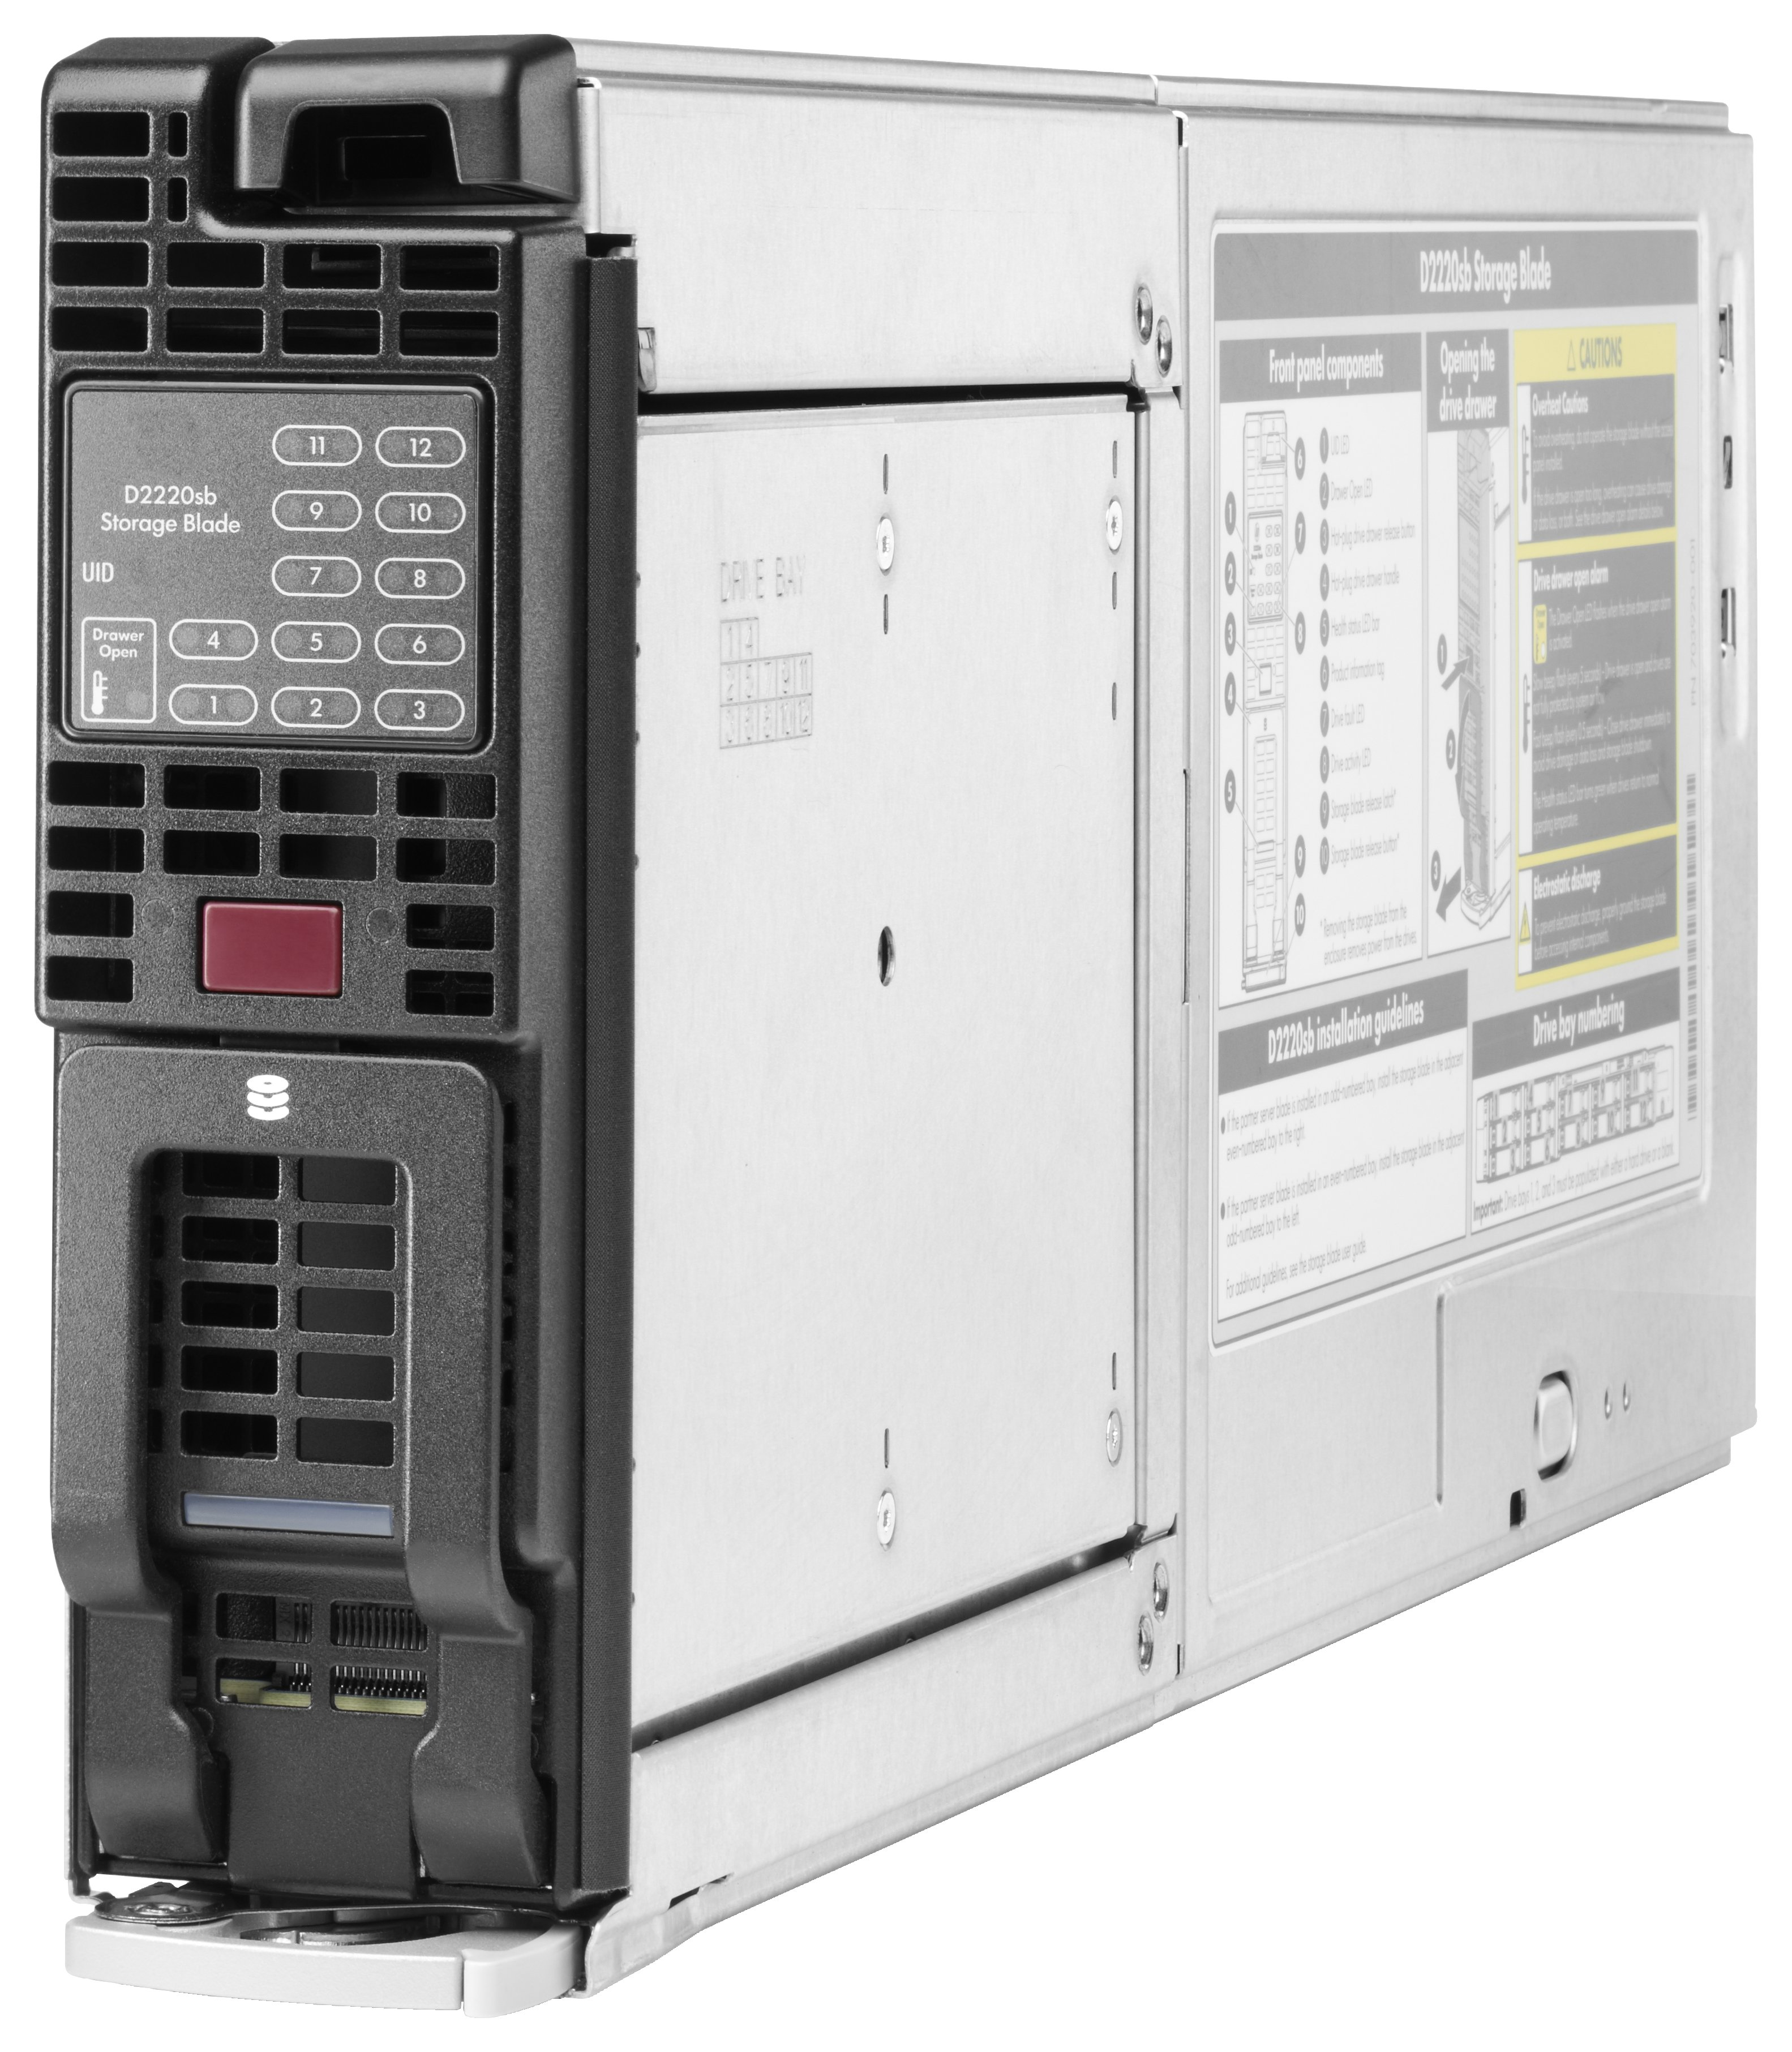 HPE D2220sb Storage Blade   Product Details   shi com